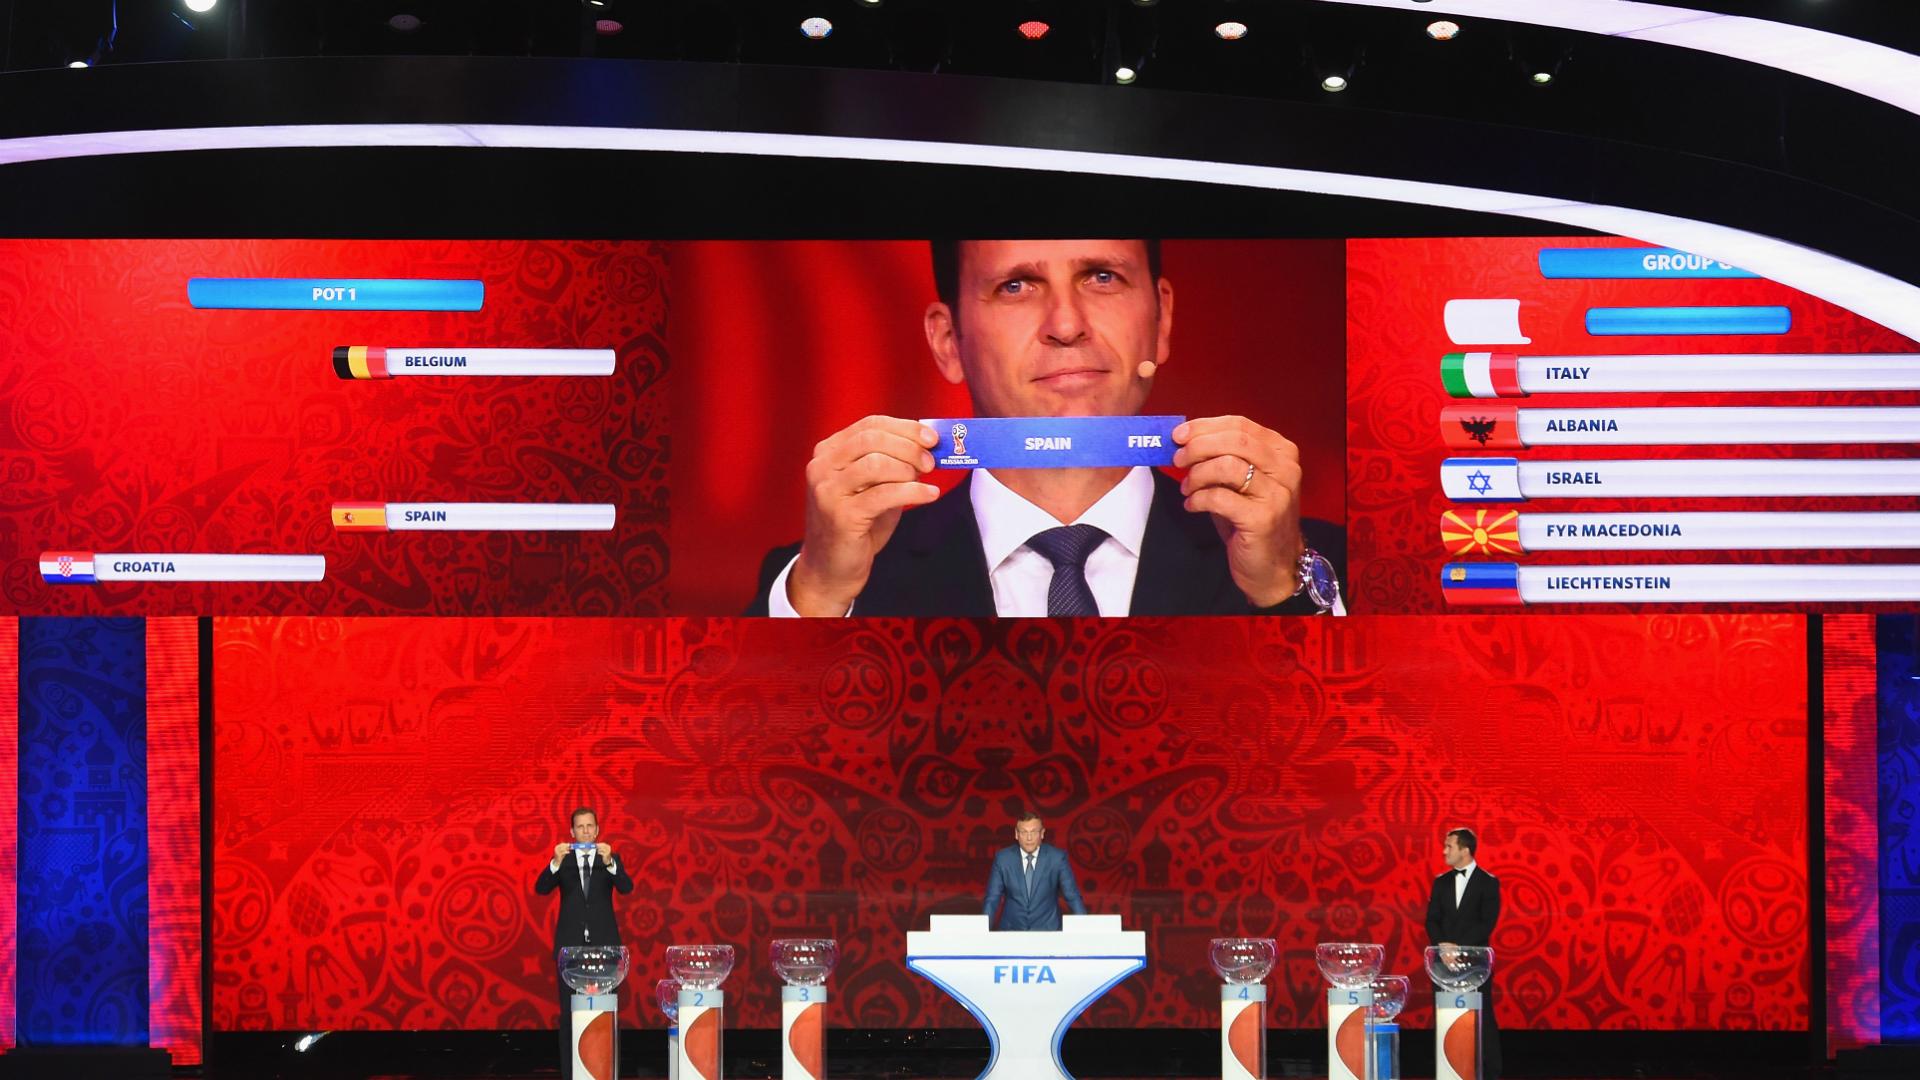 Russia 2018: Definidos os potes para sorteio da Copa do Mundo